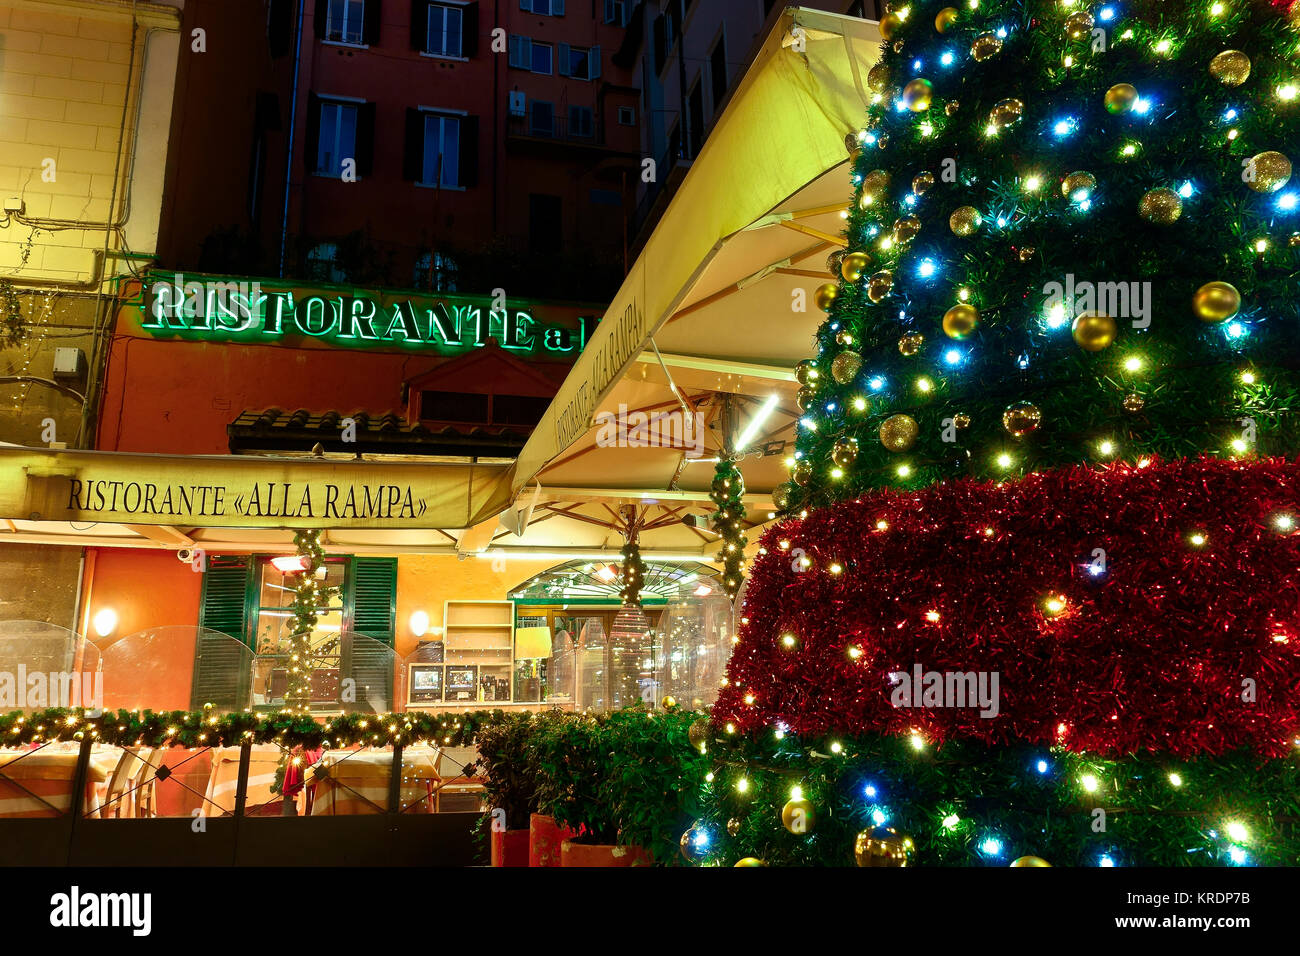 Italian restaurant exterior stock photos